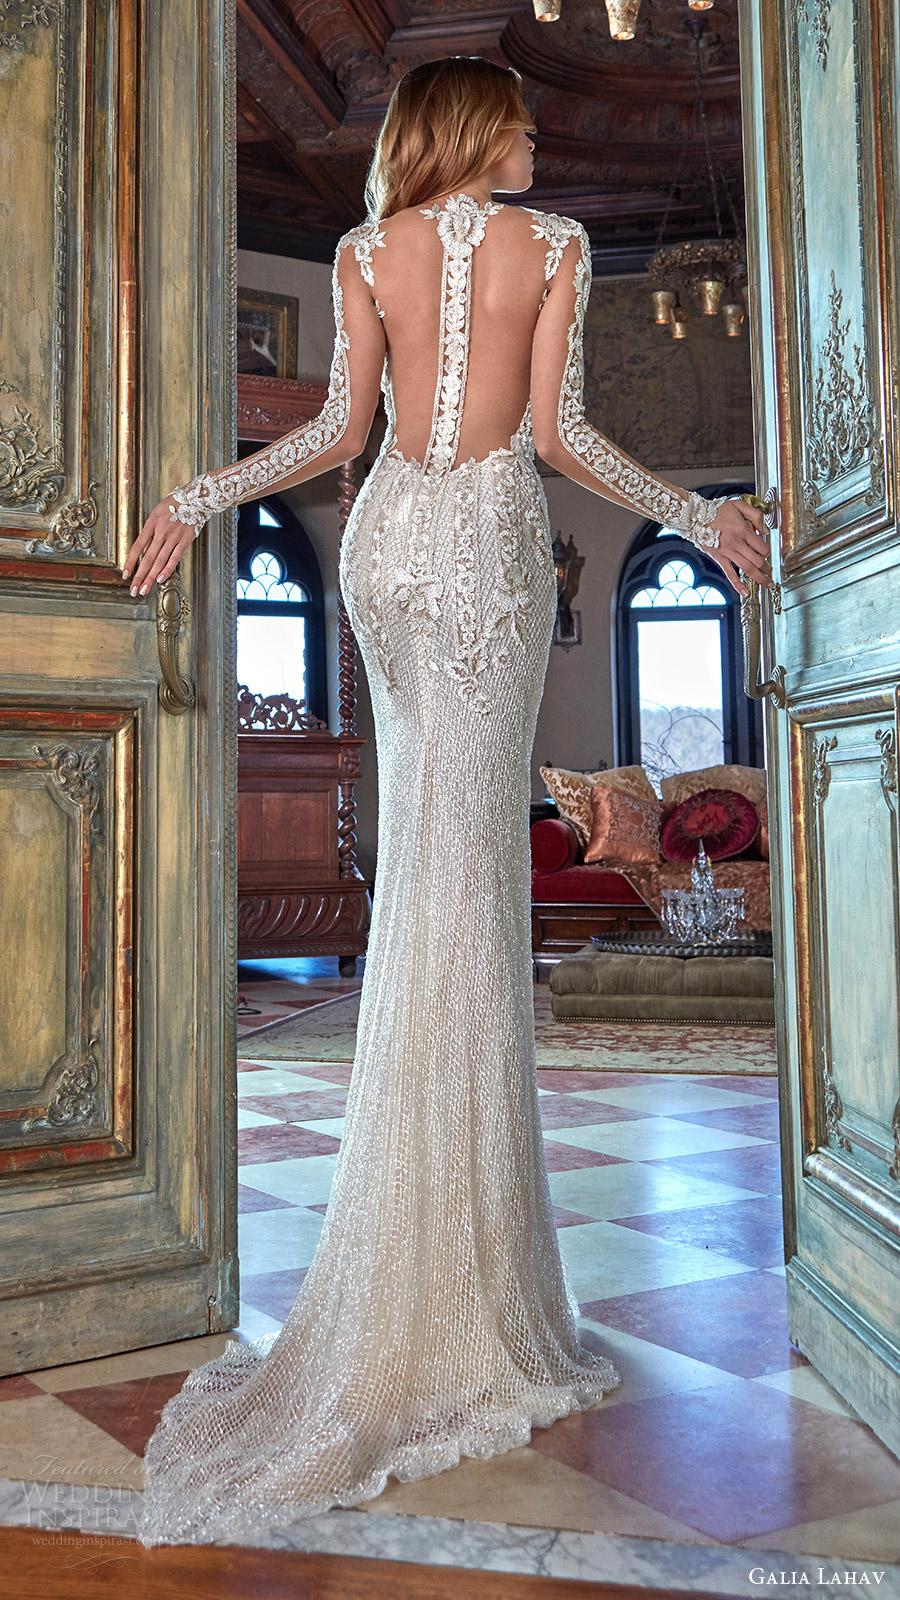 Galia Lahav Spring 2017 Couture Wedding Dresses  Le